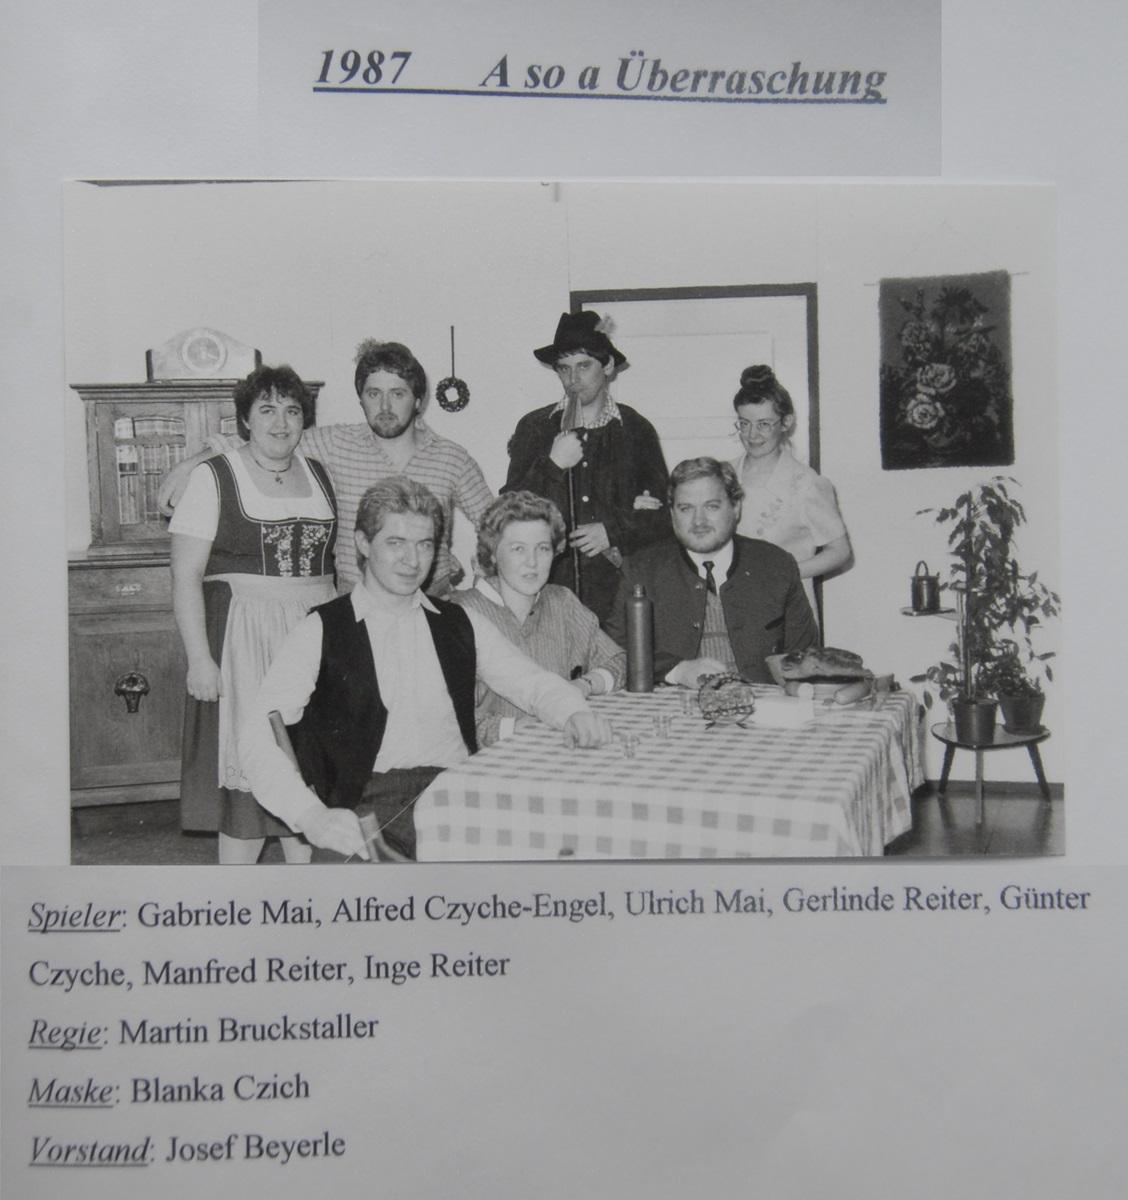 KSC-Theater-1987-A-so-a-Ueberraschung